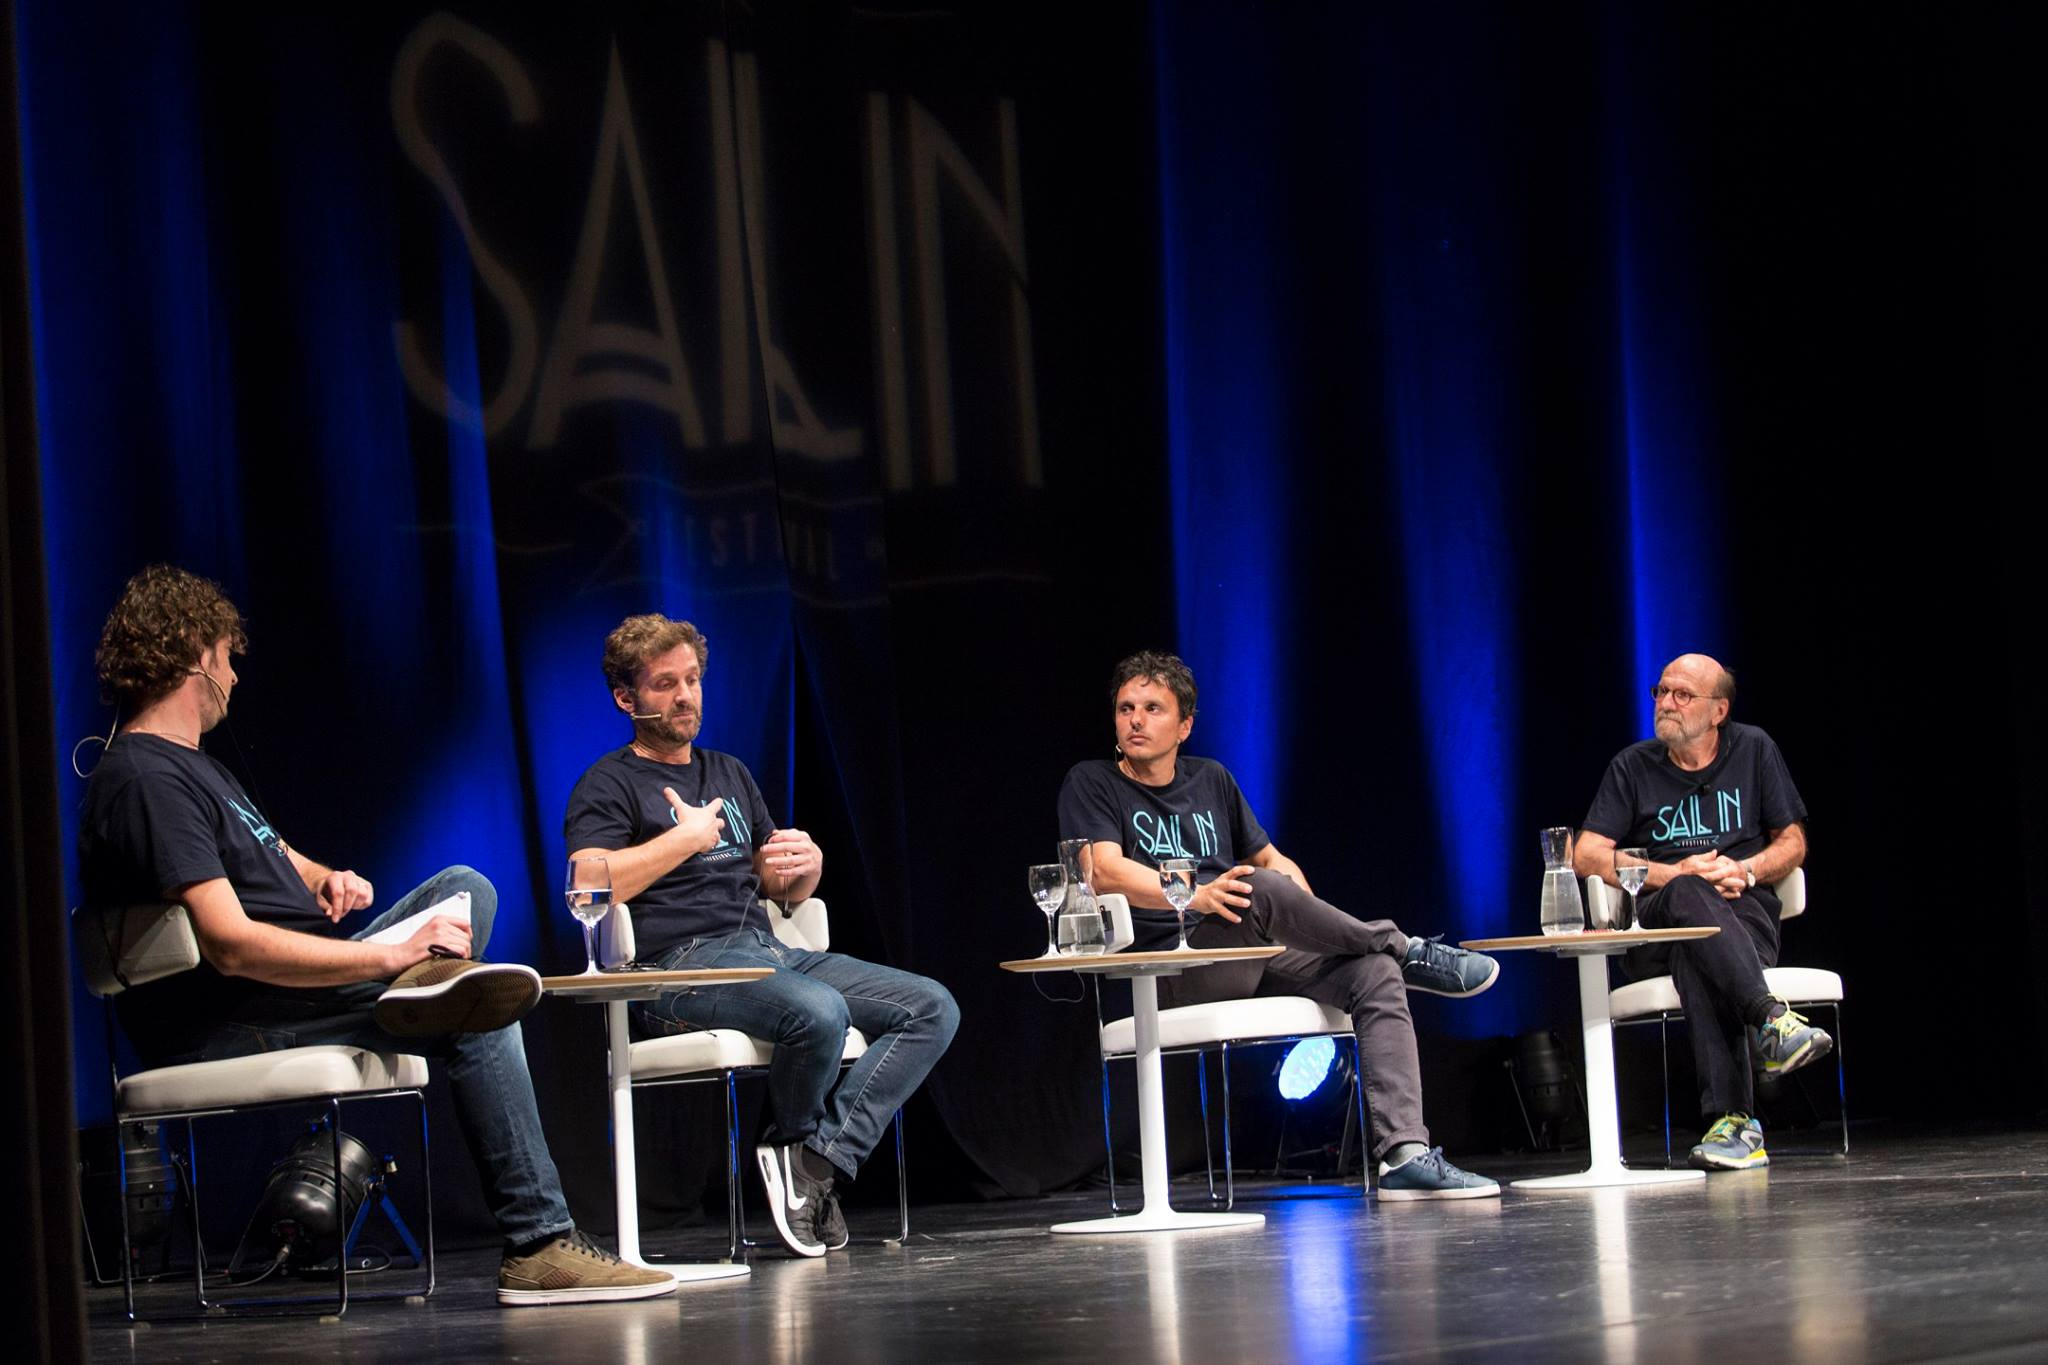 El Sail In Festival consolida su cita con Bilbao